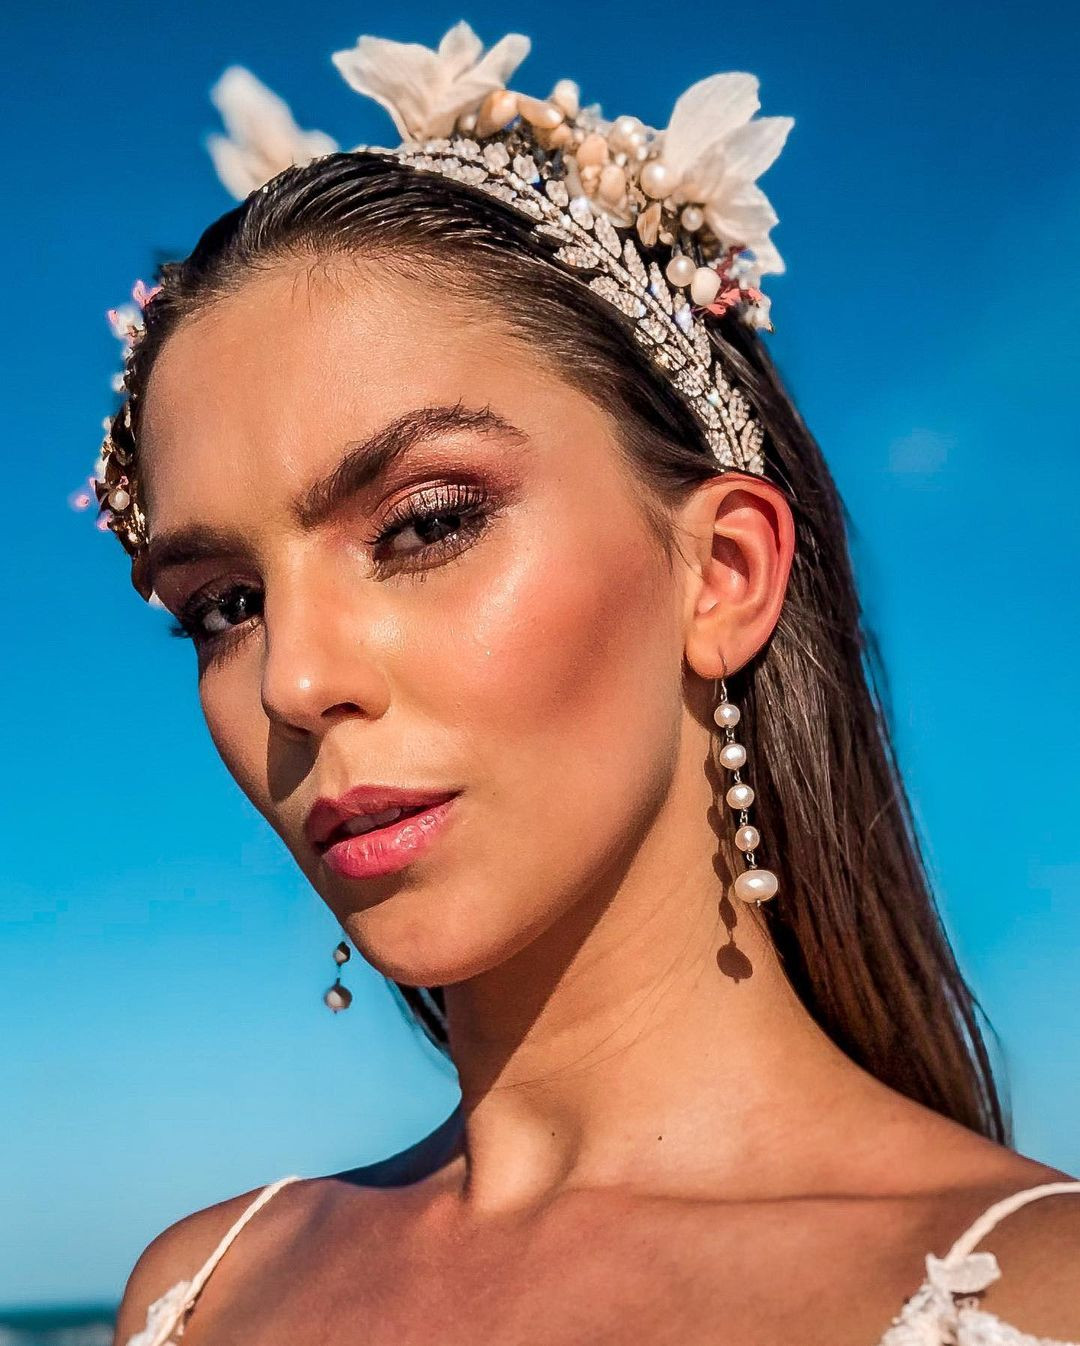 ana flavia giacomini, miss ilha dos lobos mundo 2019. - Página 2 Fvoipj10